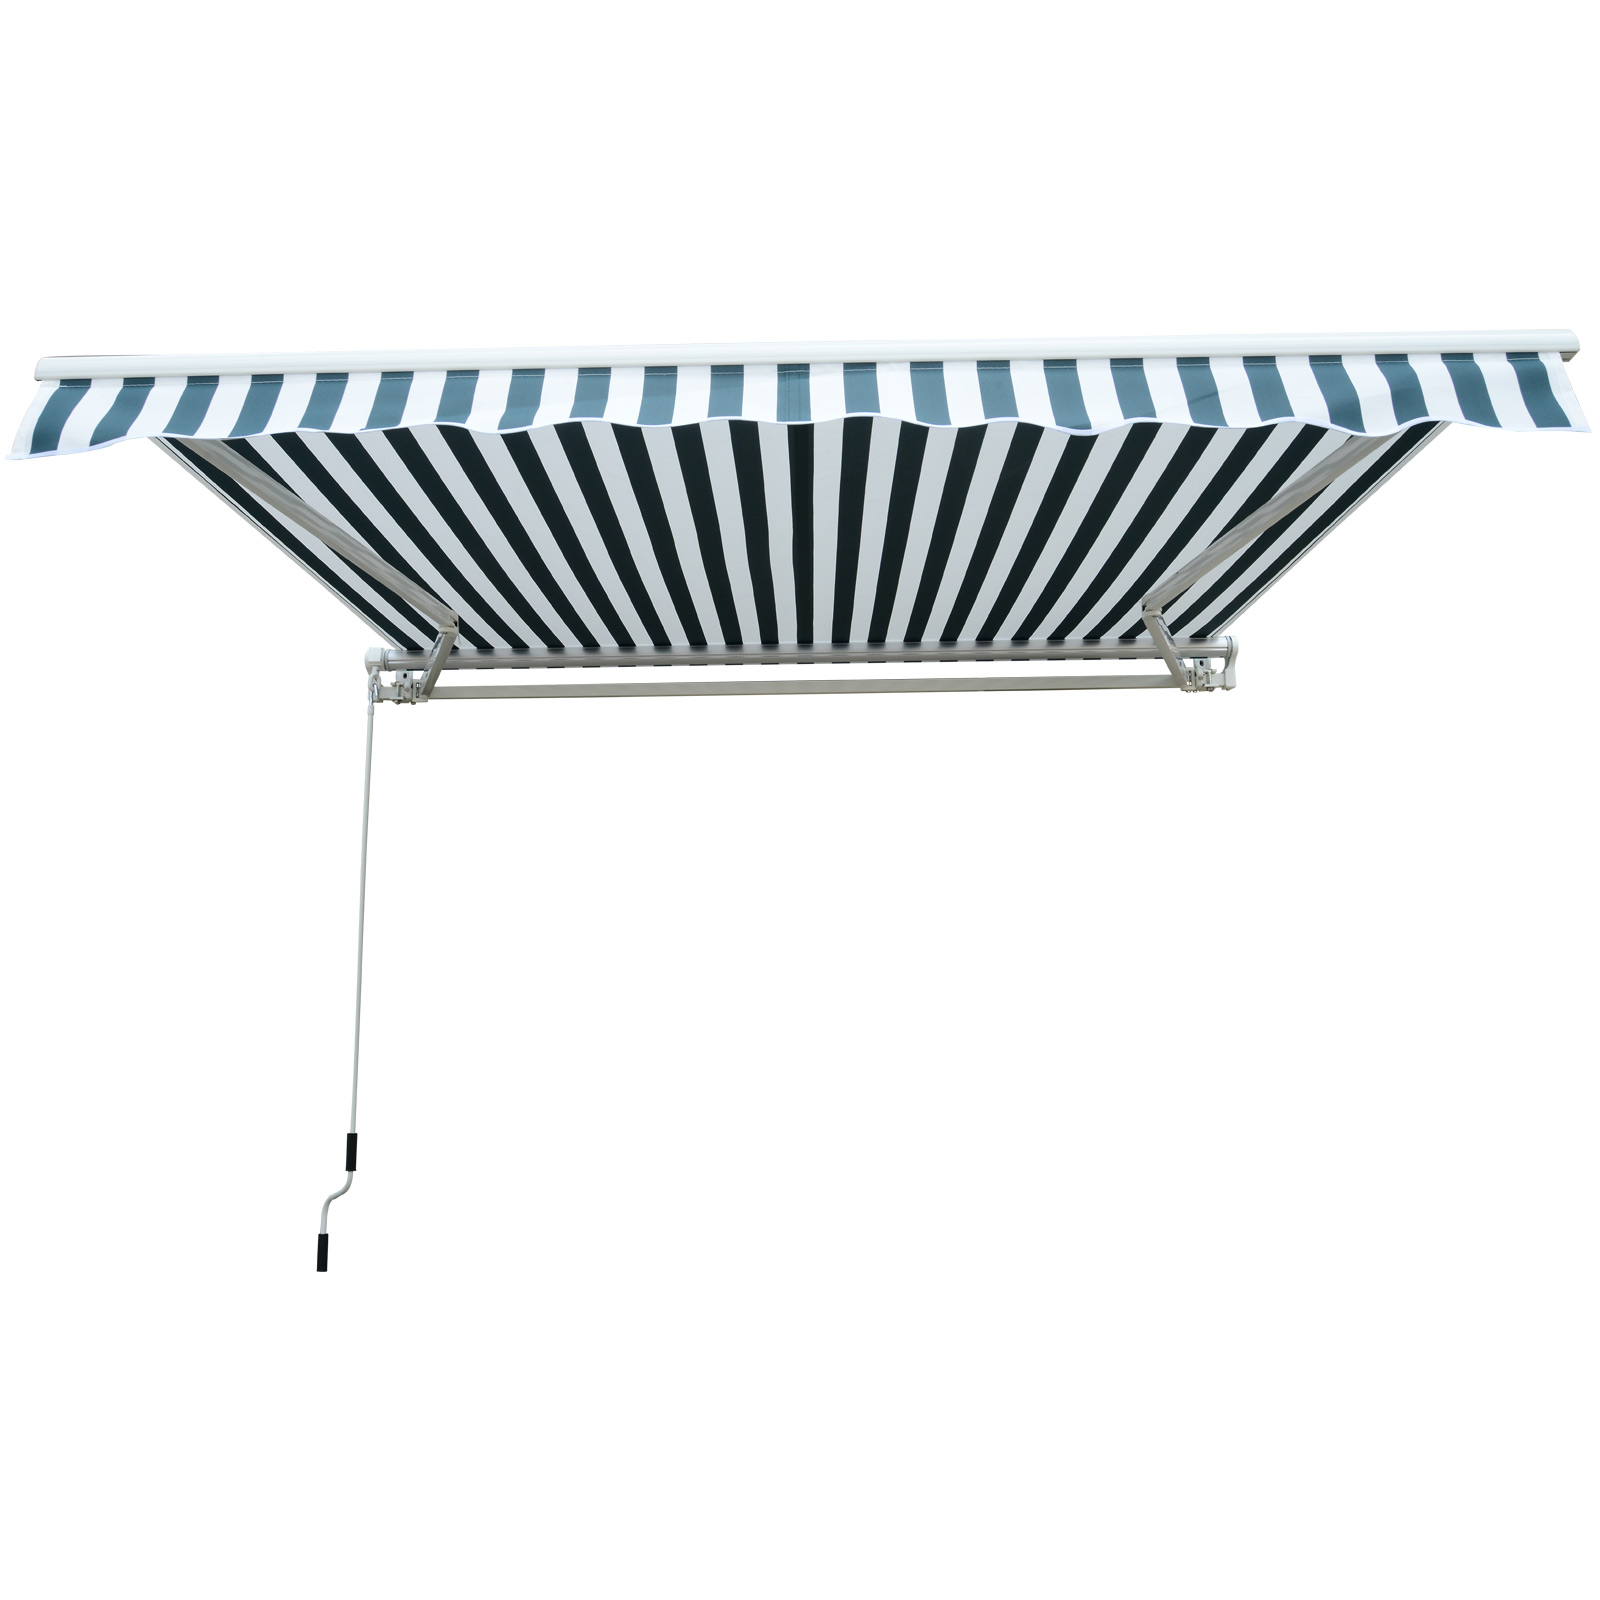 Garden-Patio-Manual-Awning-Canopy-Sun-Shade-Shelter-Retractable-4-Size-5-Colour thumbnail 25